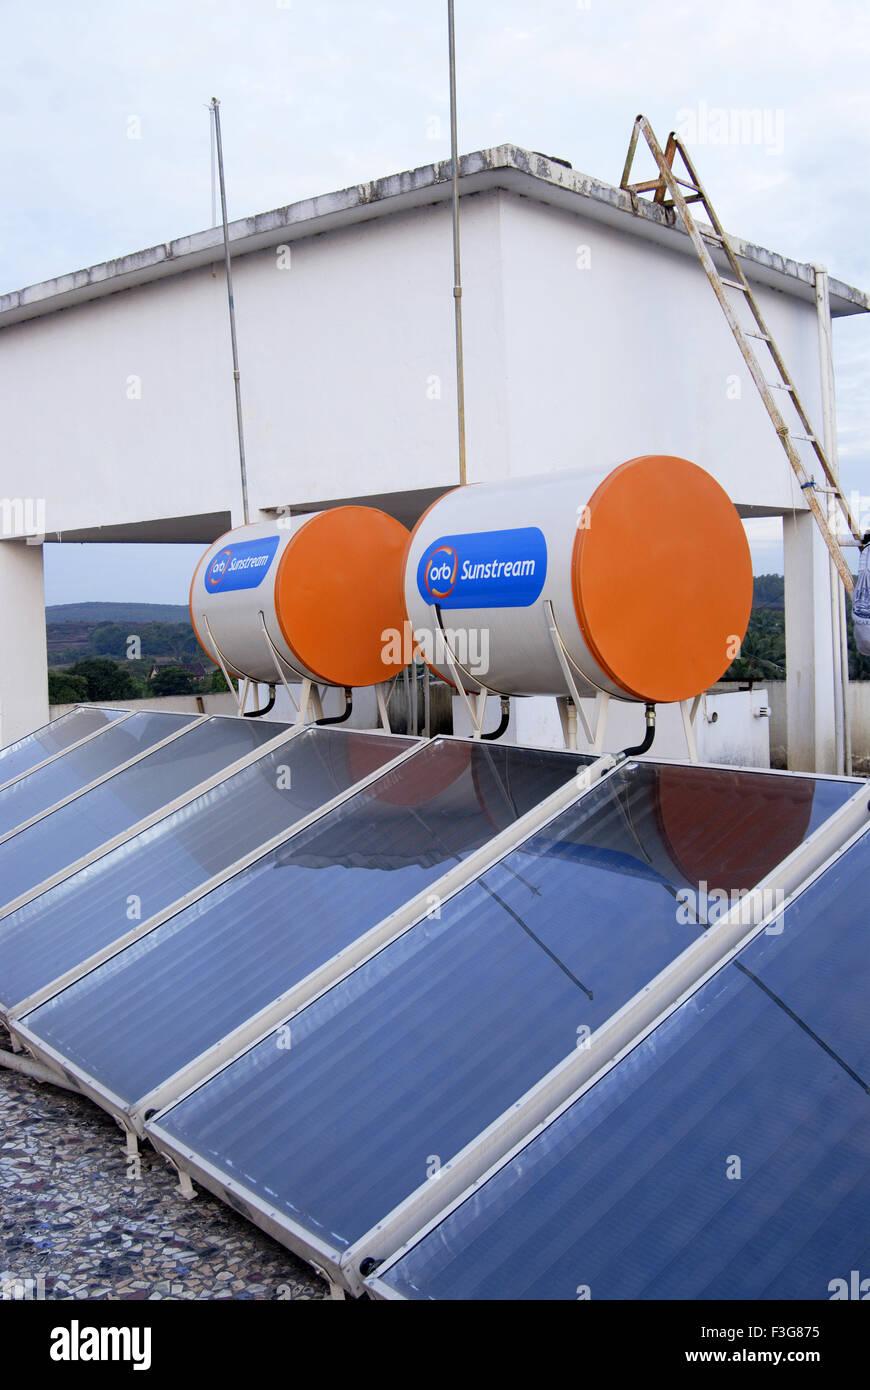 Chauffe-eau solaire dans l'hôtel à Kumta Karnataka; Inde; Photo Stock